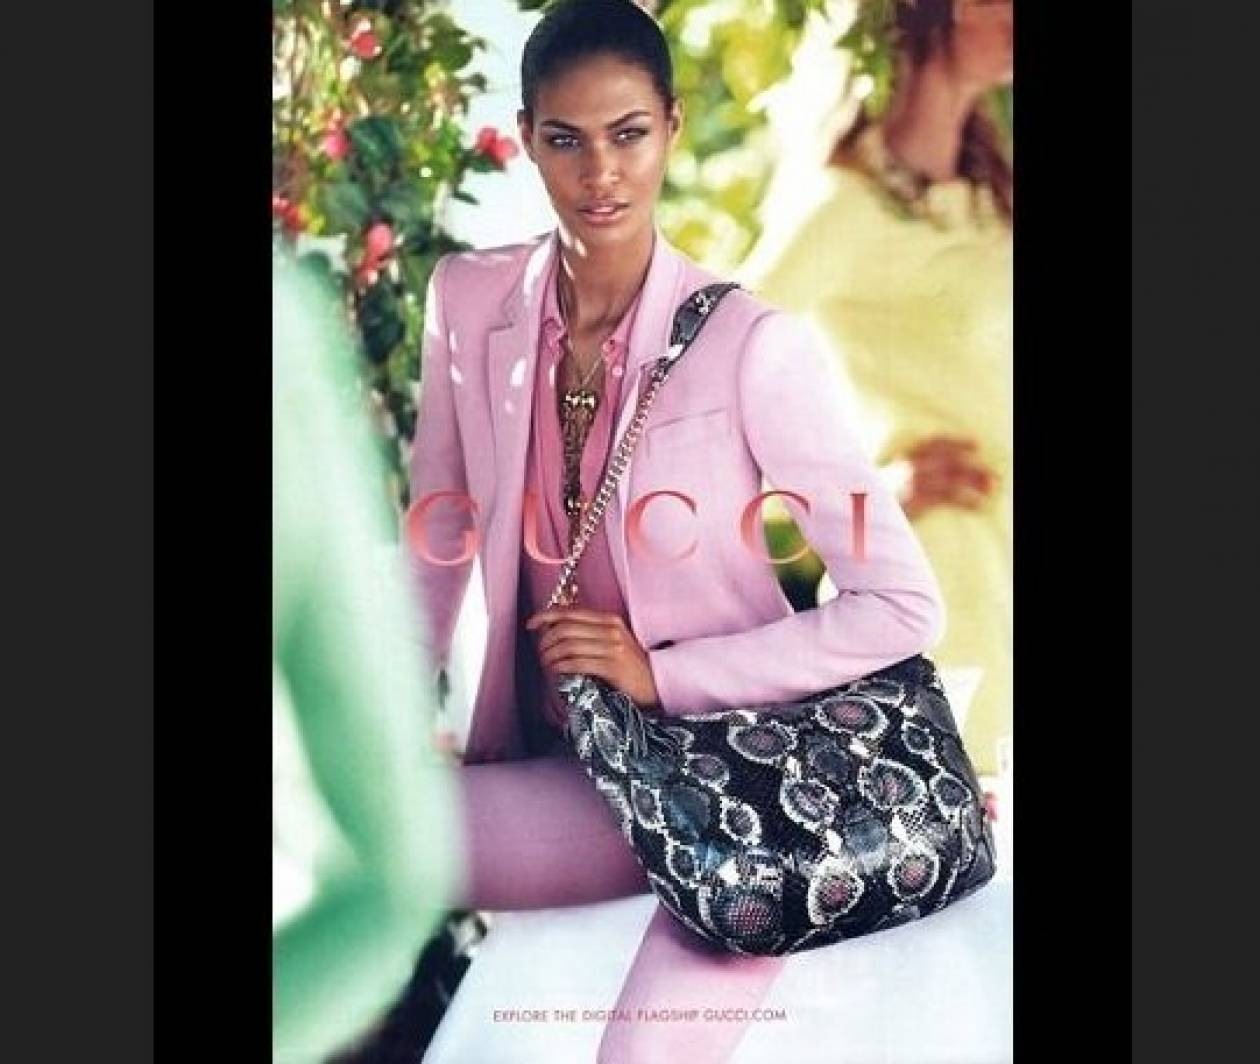 Photoshop λάθος: Η νέα καμπάνια Gucci υπέστη «κακές επεμβάσεις»